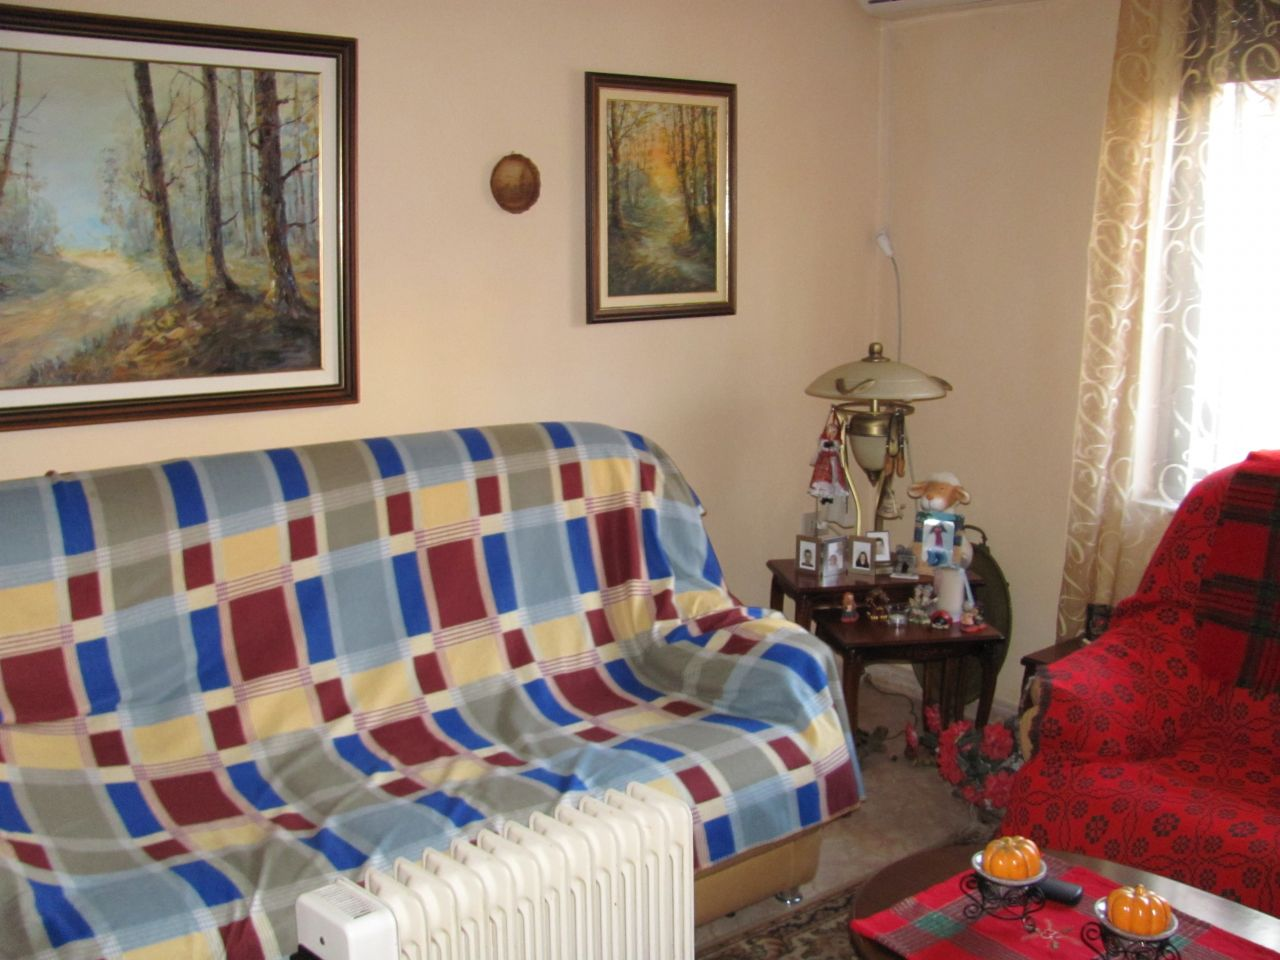 Villa for Rent in Tirana, Albania located at Kavaja Street